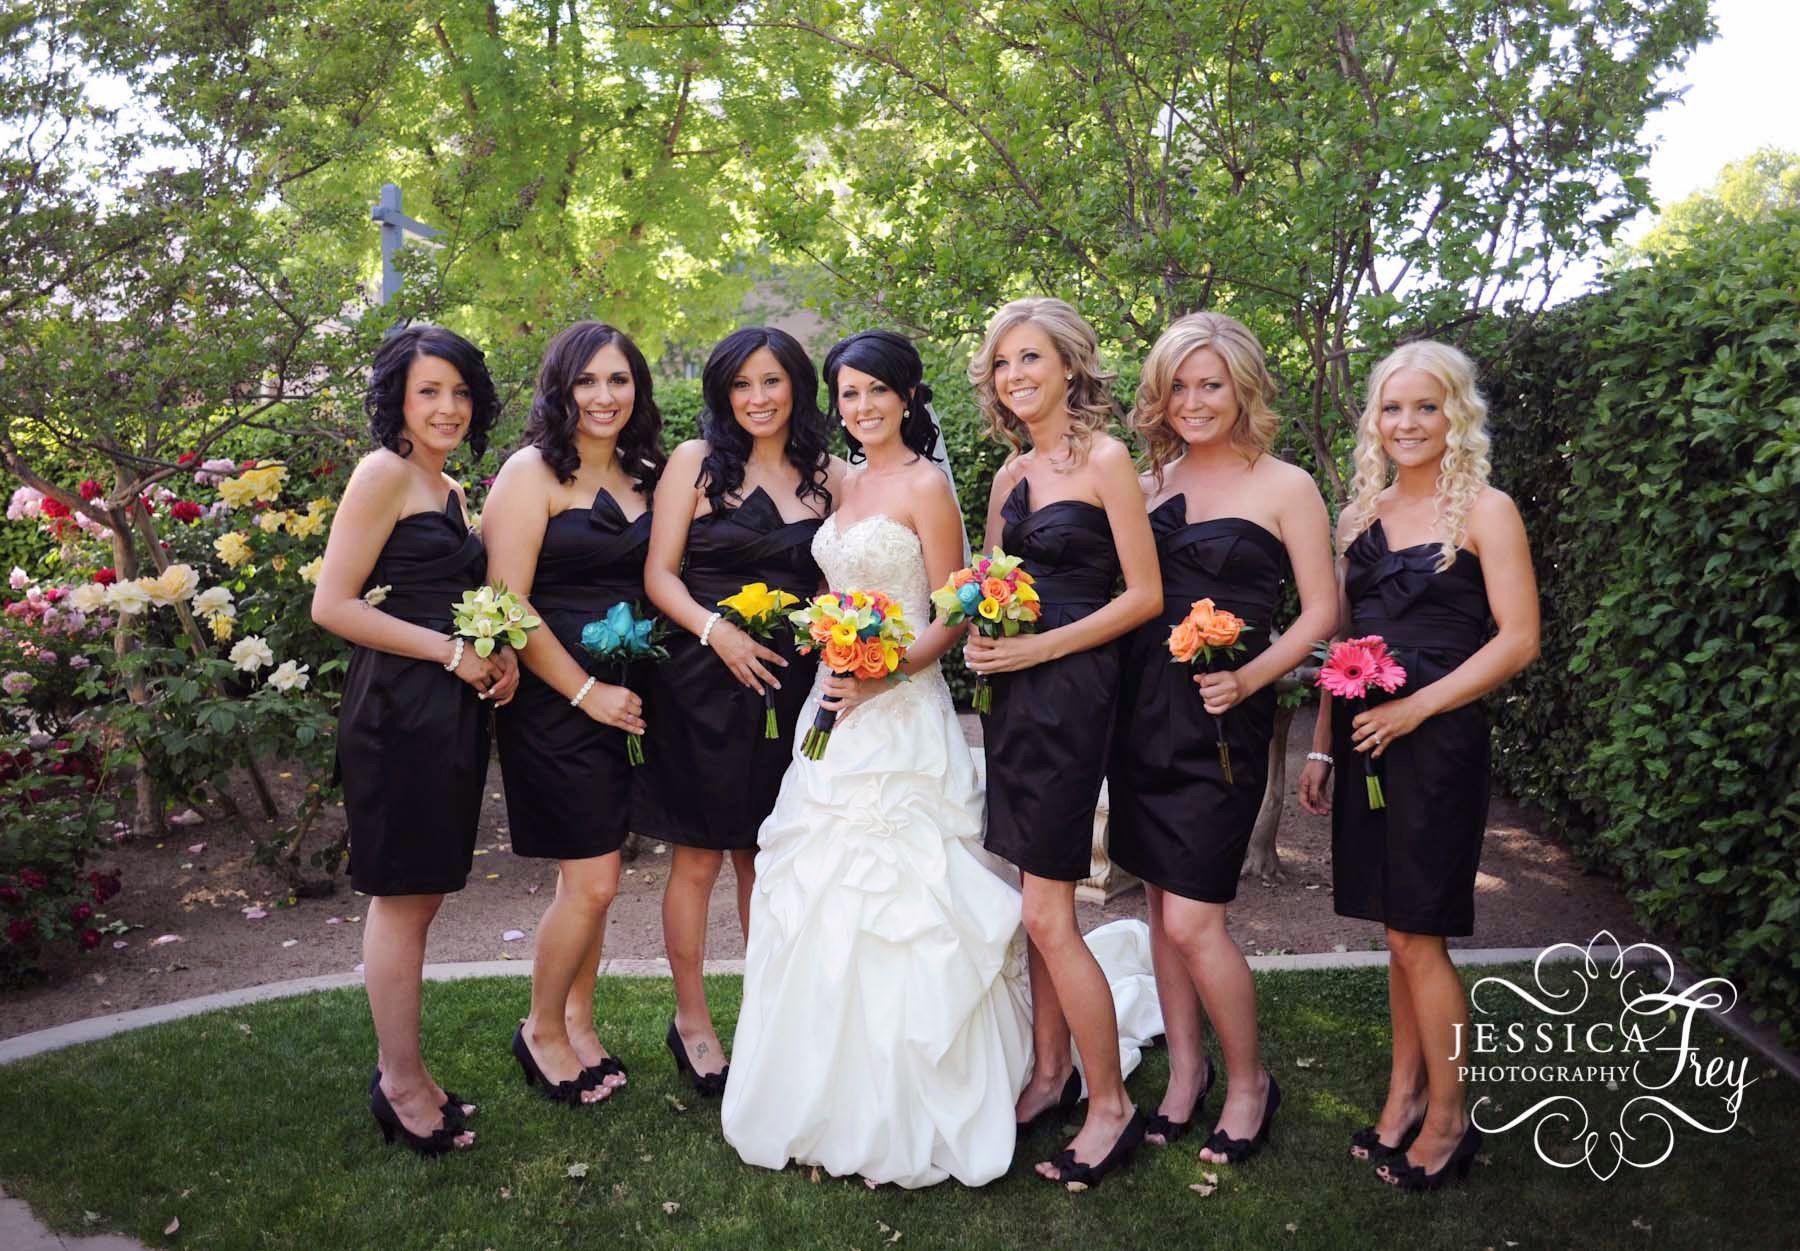 bridesmaid wedding dresses black brides made dresses Bridesmaid dresses 01 Wedding Wednesday Bridesmaid Dresses